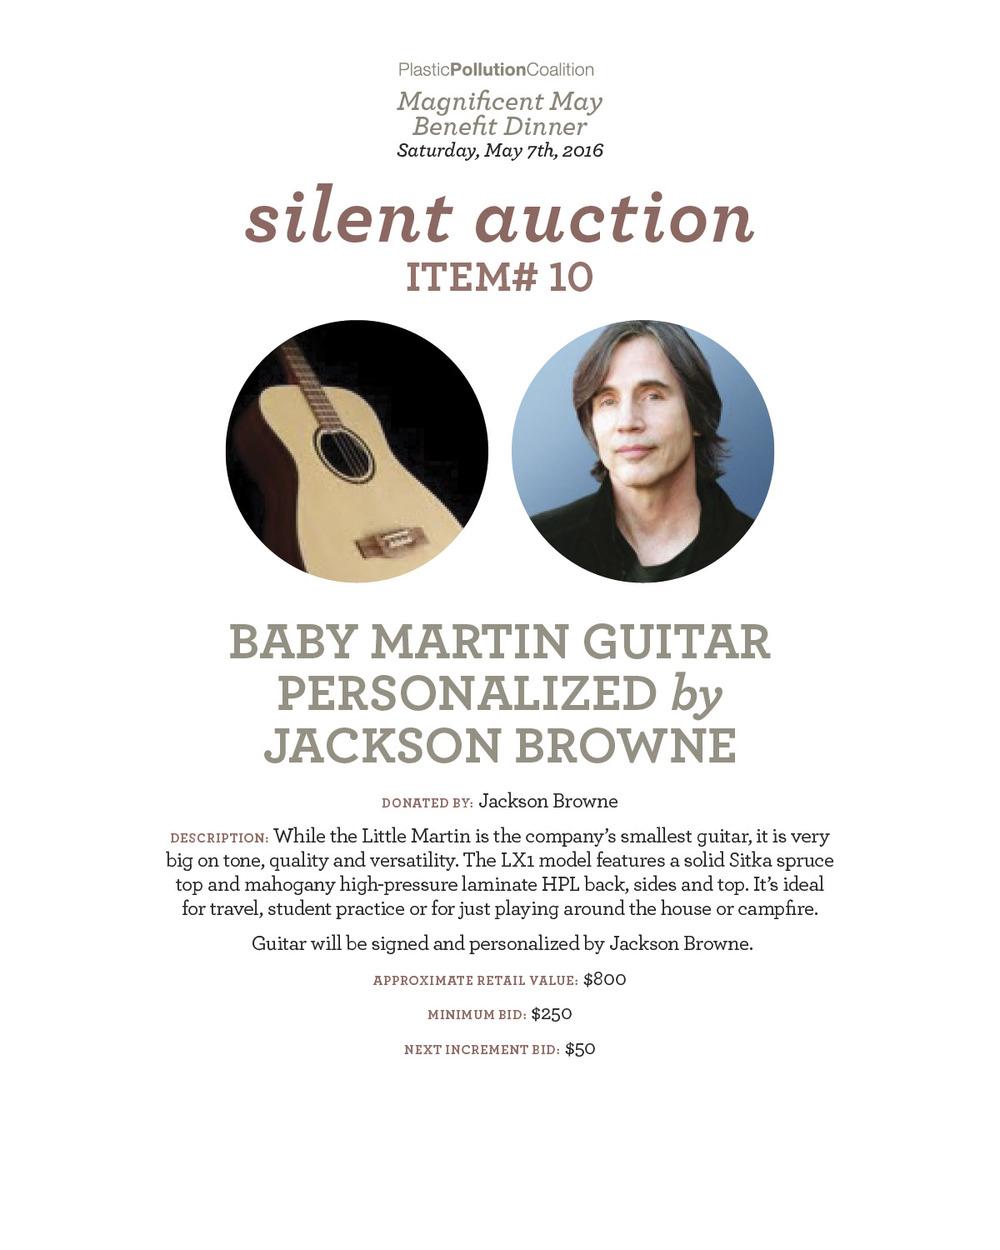 baby martin guitar